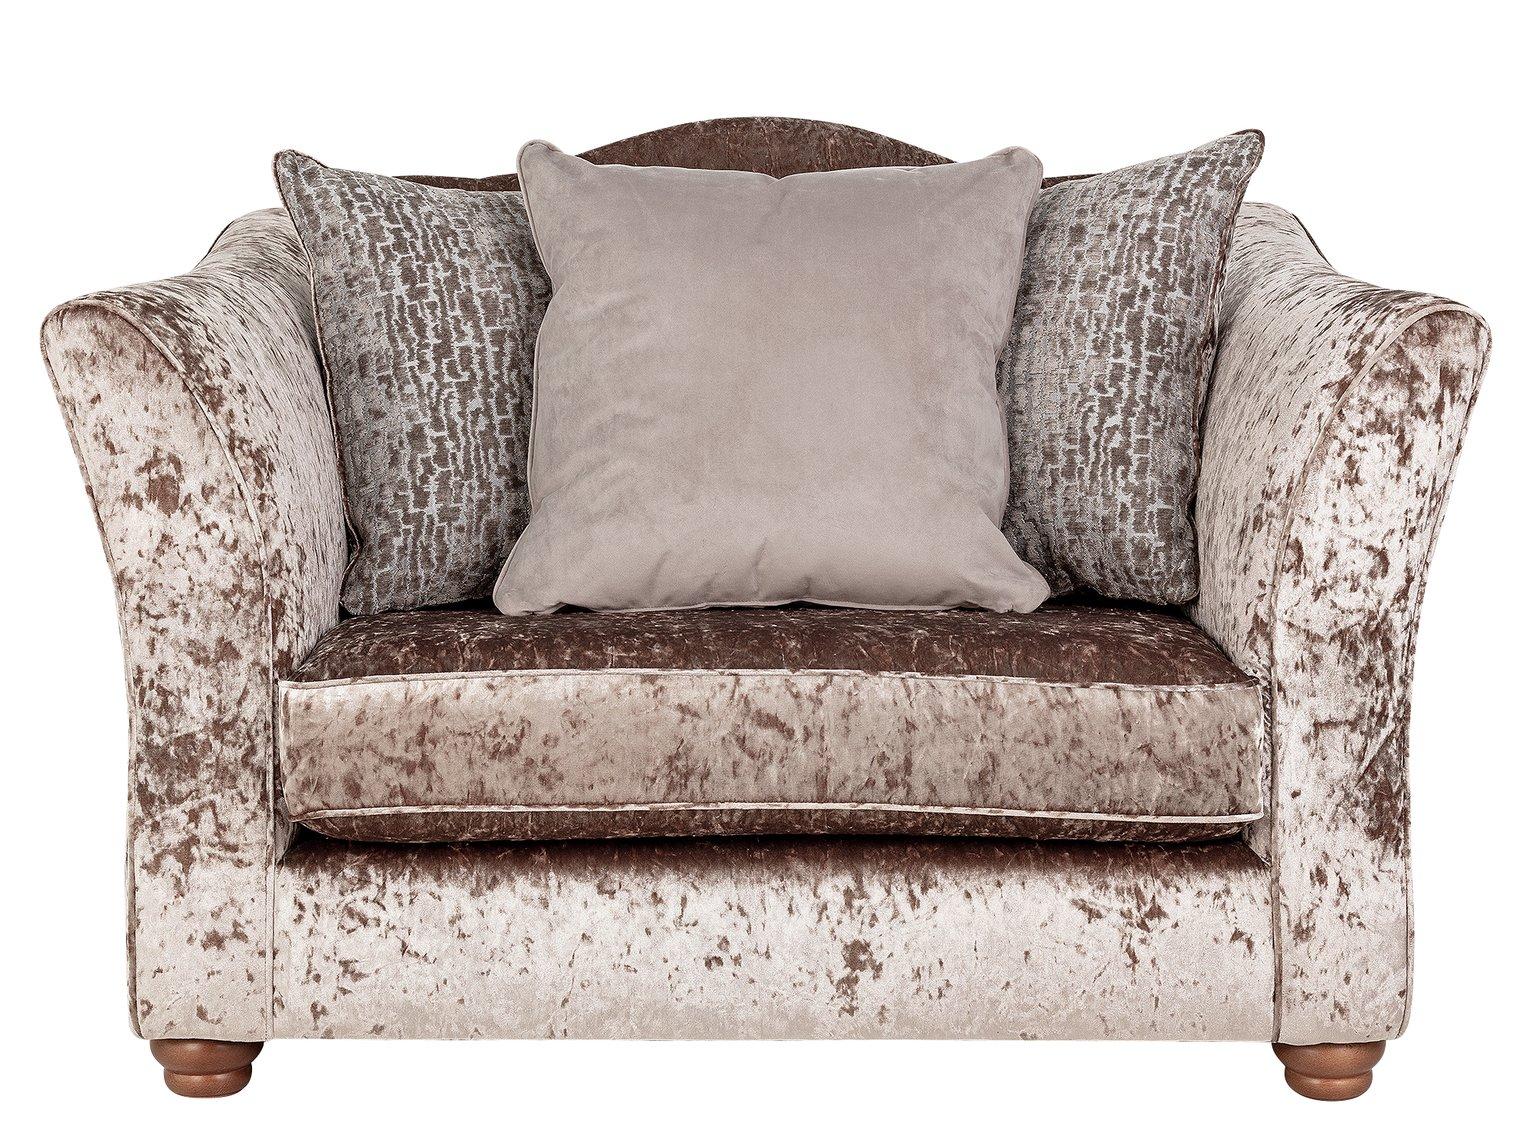 Argos Home Fantasia Velvet Cuddle Chair - Truffle